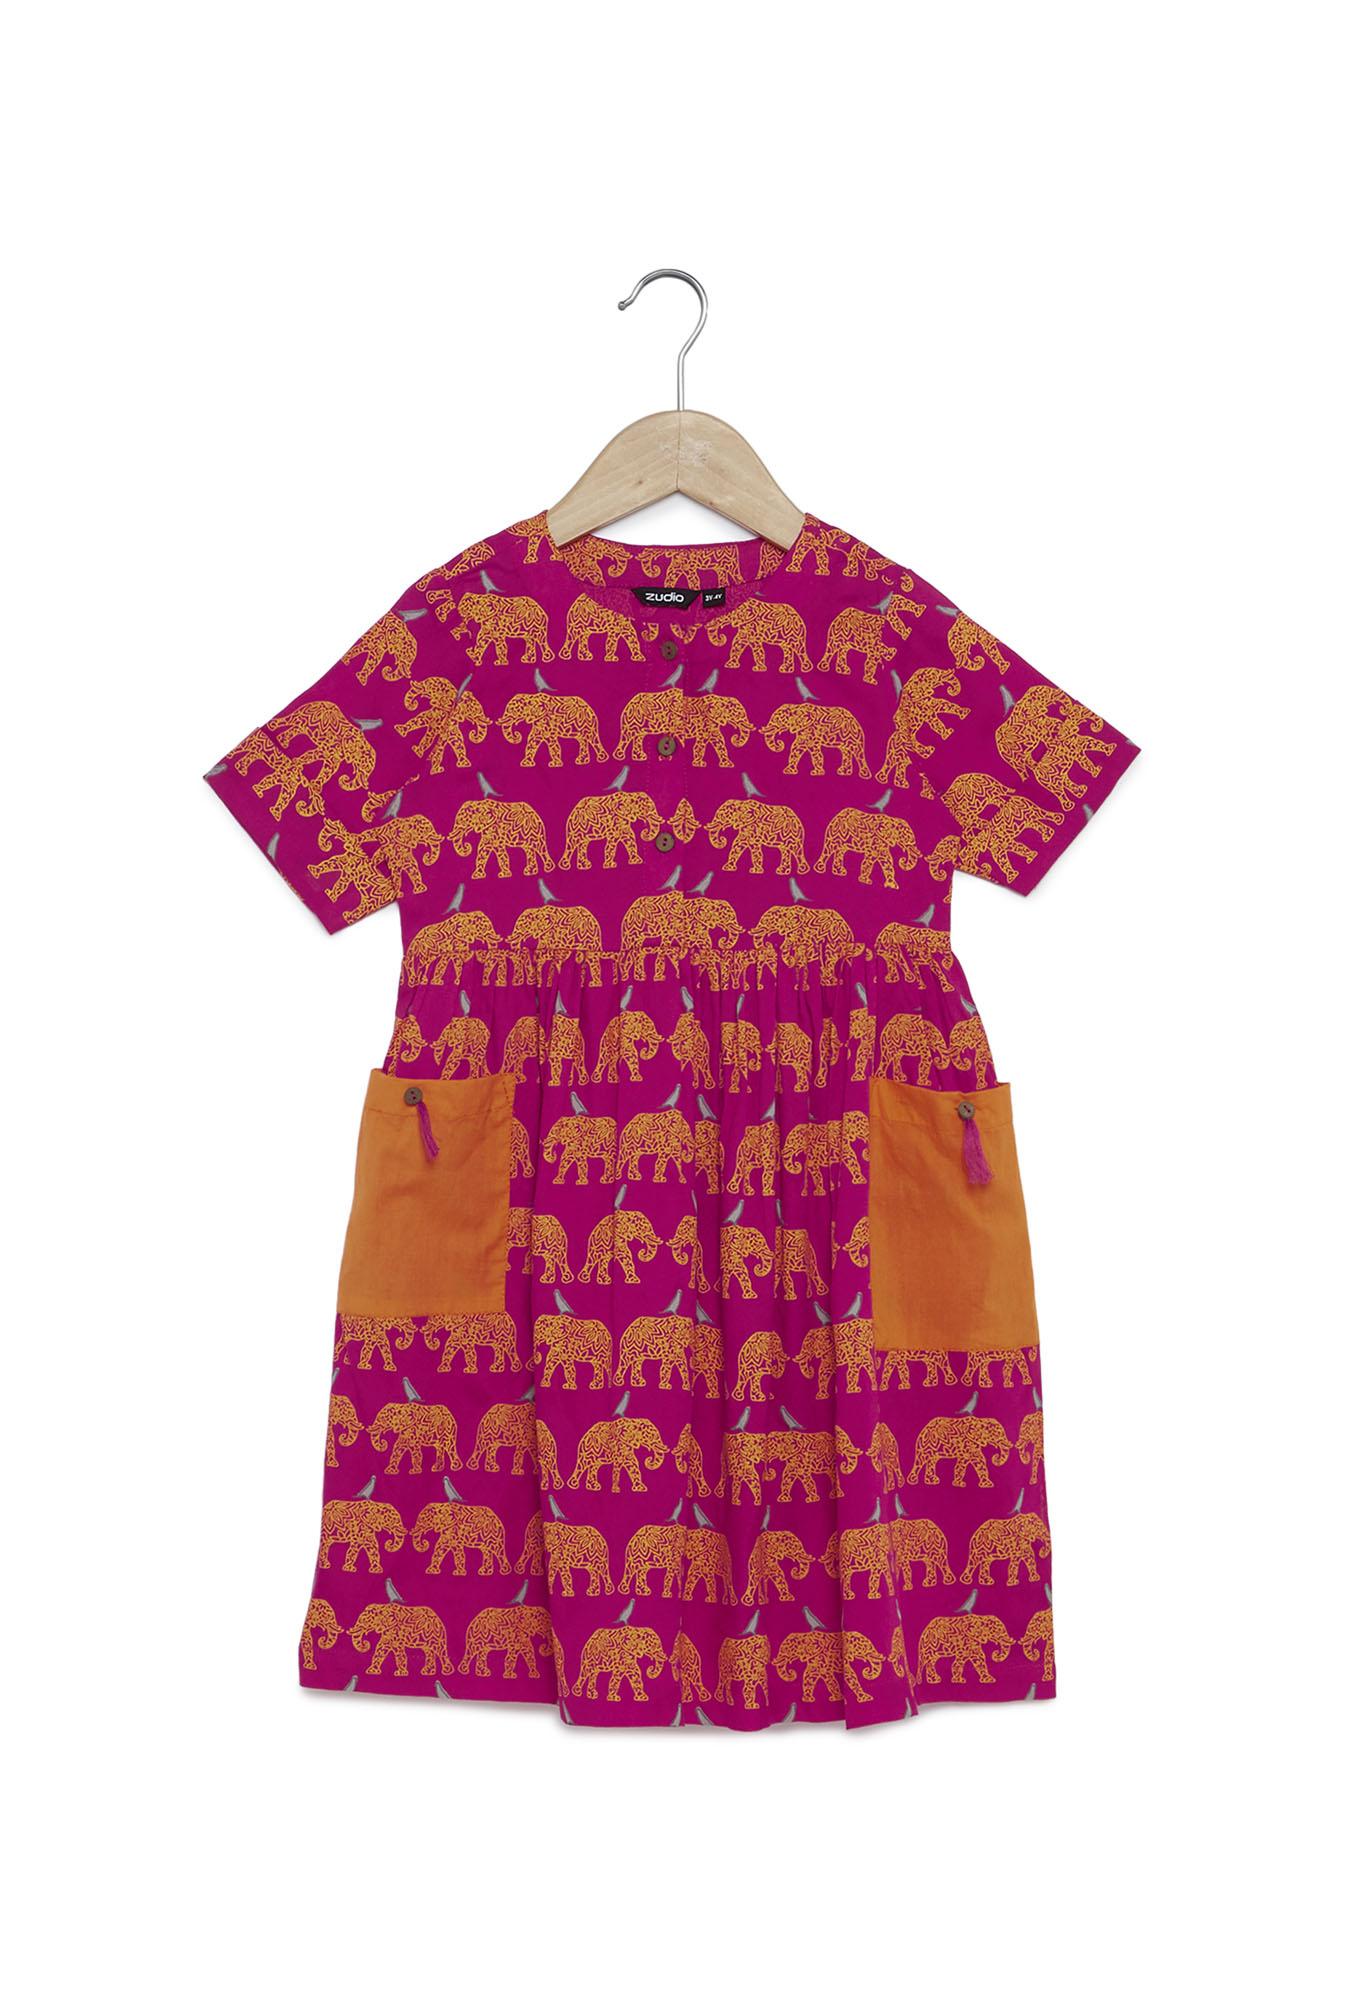 2f91eada7535 Buy Zudio Kids Fuchsia Animal Print Dress for Girls Clothing Online ...